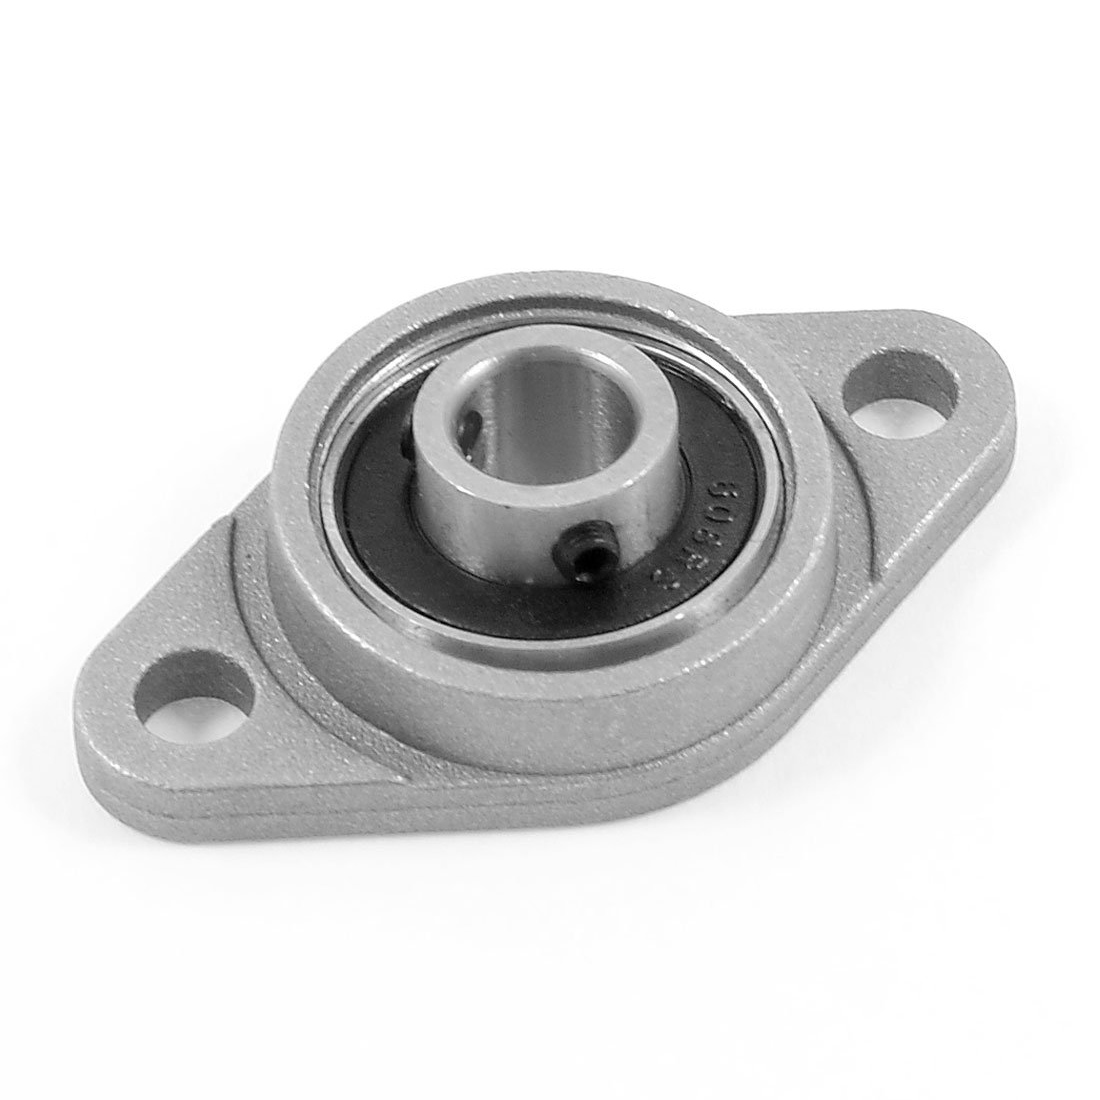 wsfs-hot-kfl08-8mm-mounted-block-cast-housing-self-aligning-pillow-bearing